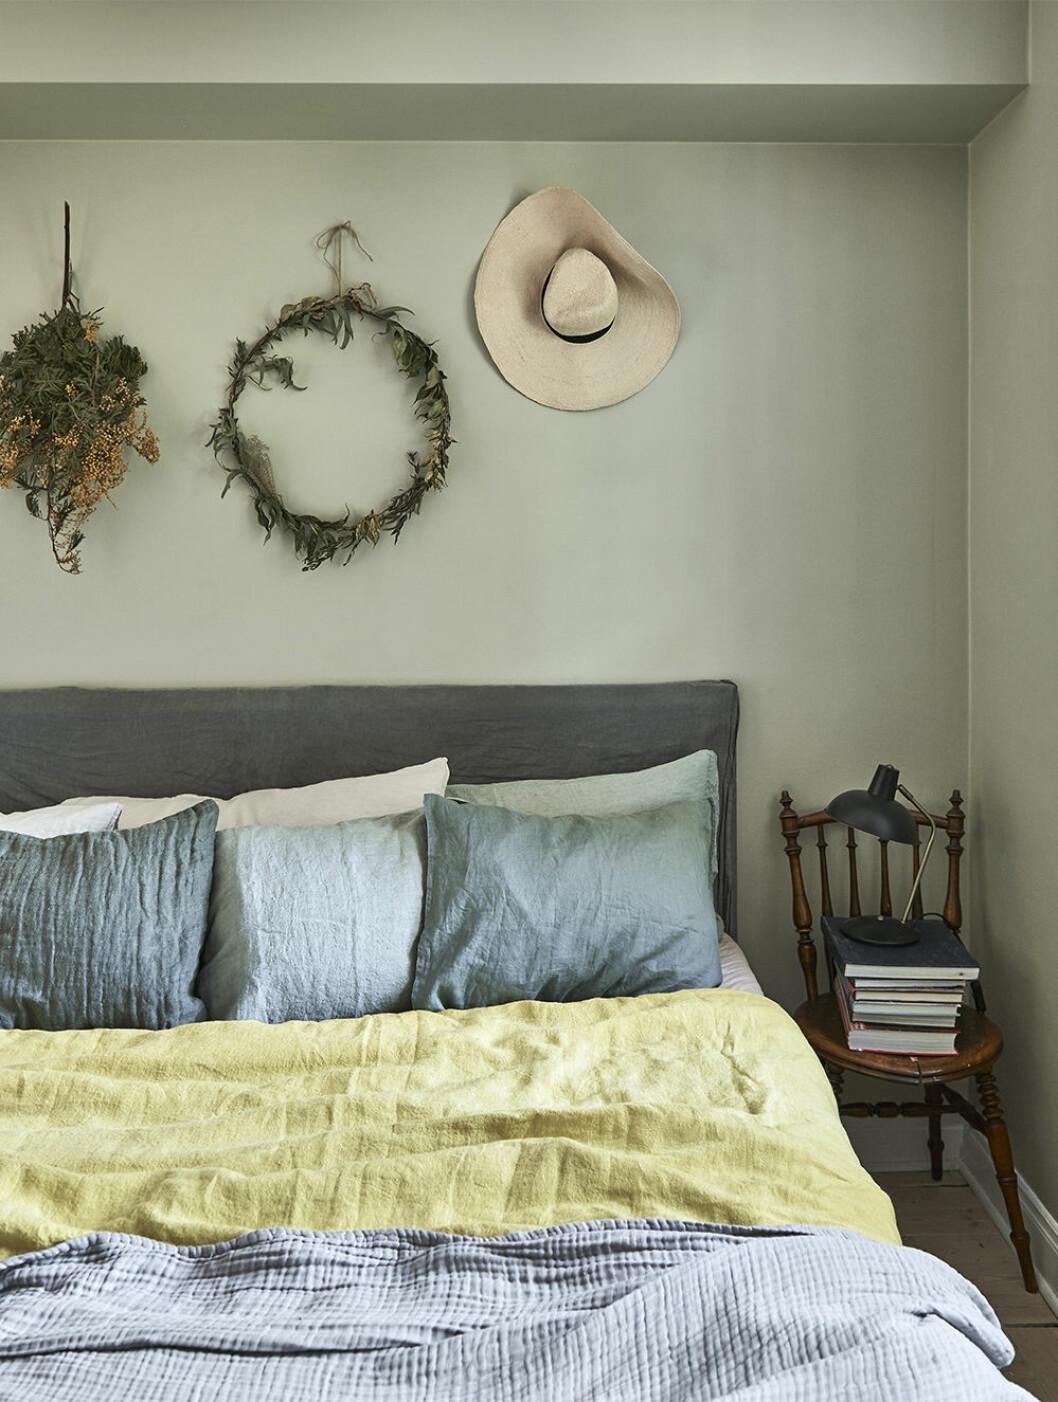 Somrigt sovrum i grönt med kransar